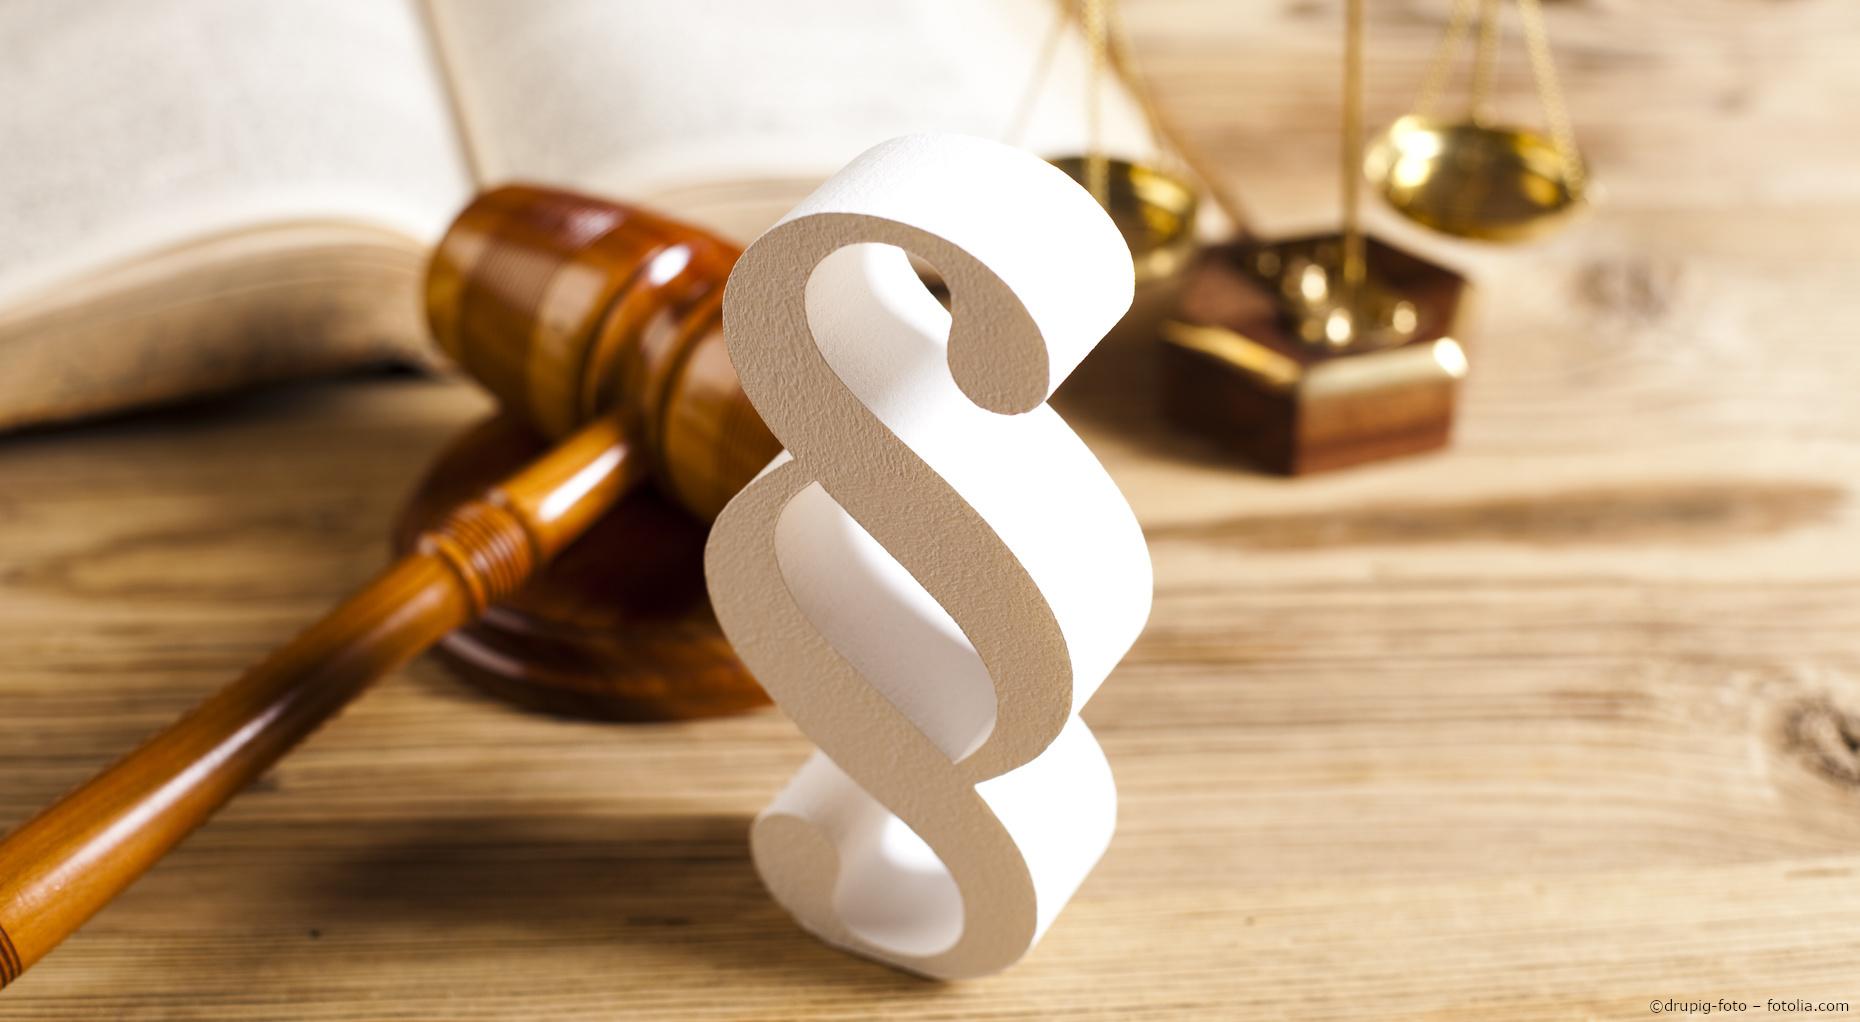 Ausbildungsrecht – was müssen Personaler beachten?